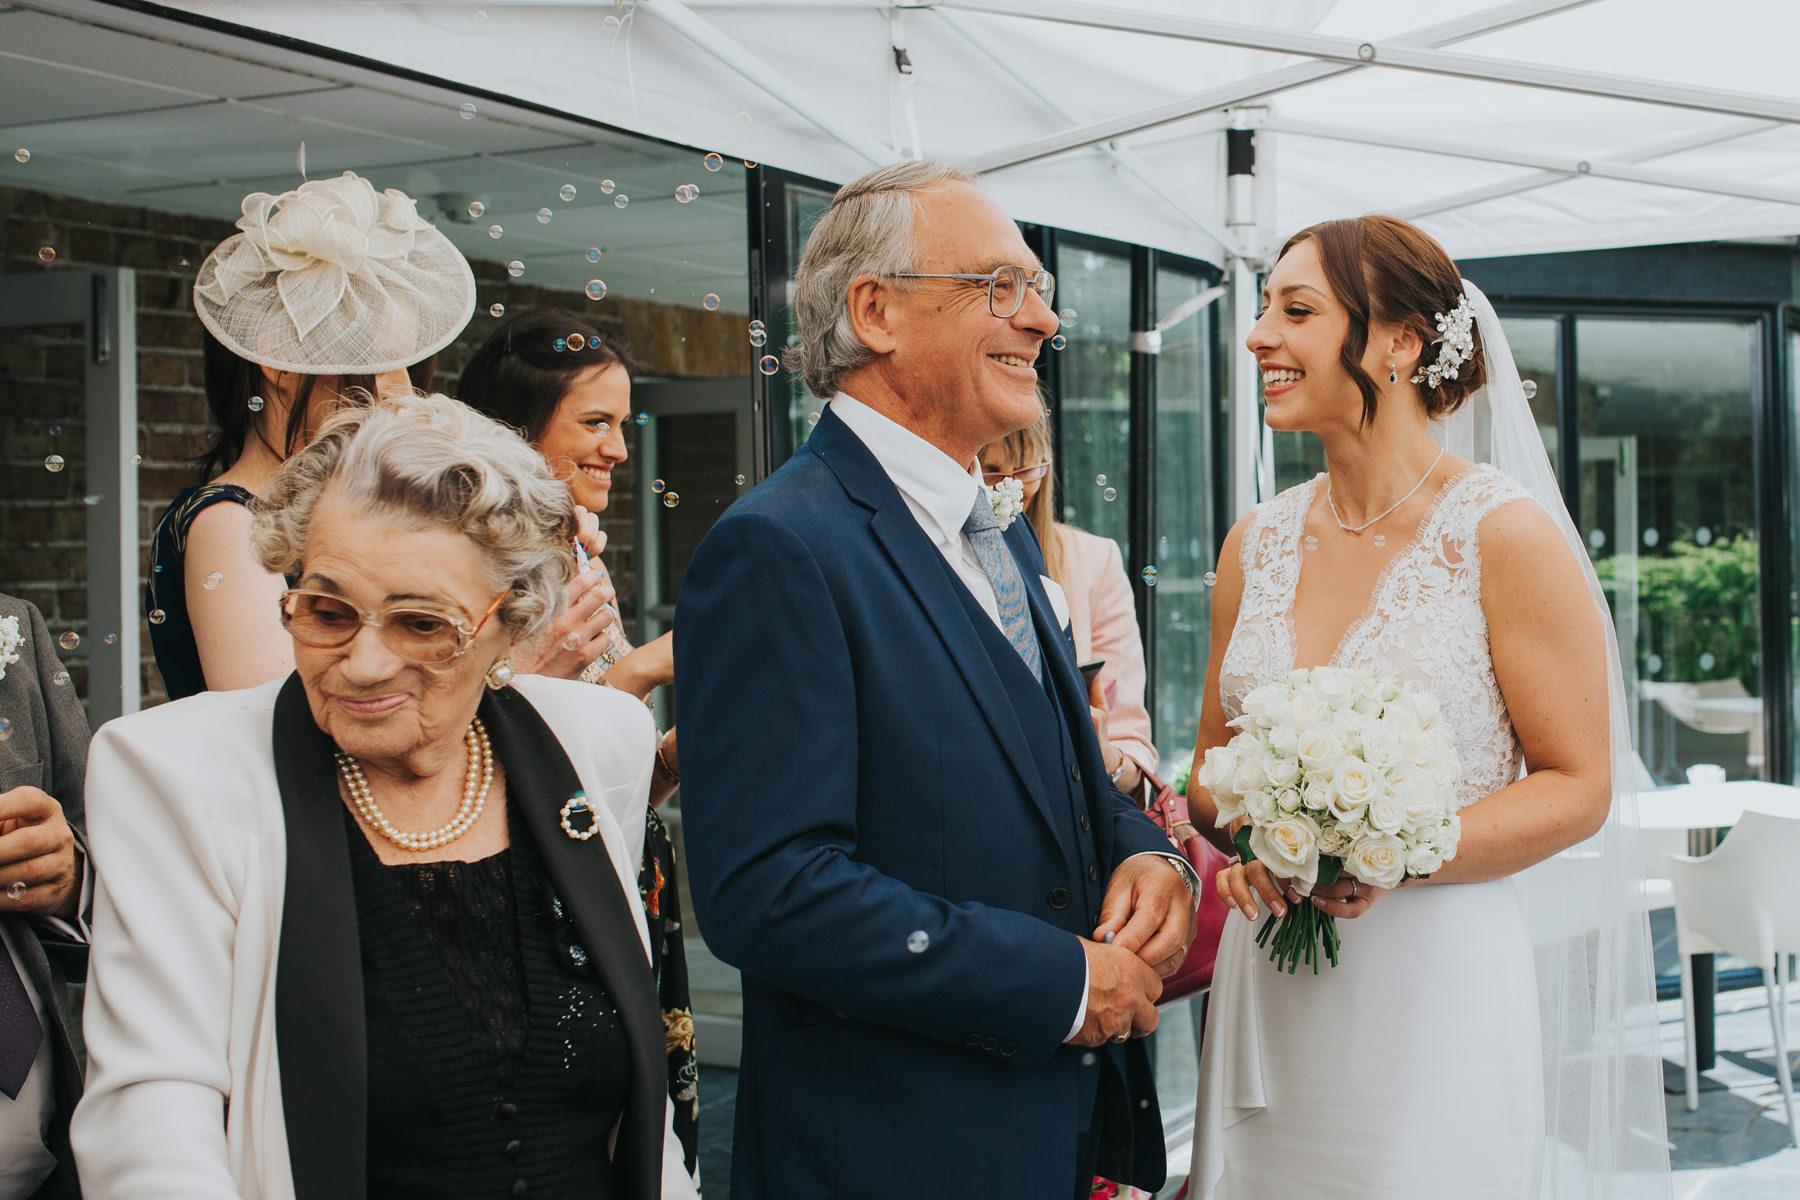 CRL-237-The Bingham Wedding Richmond-groom bride guests blowing bubbles.jpg